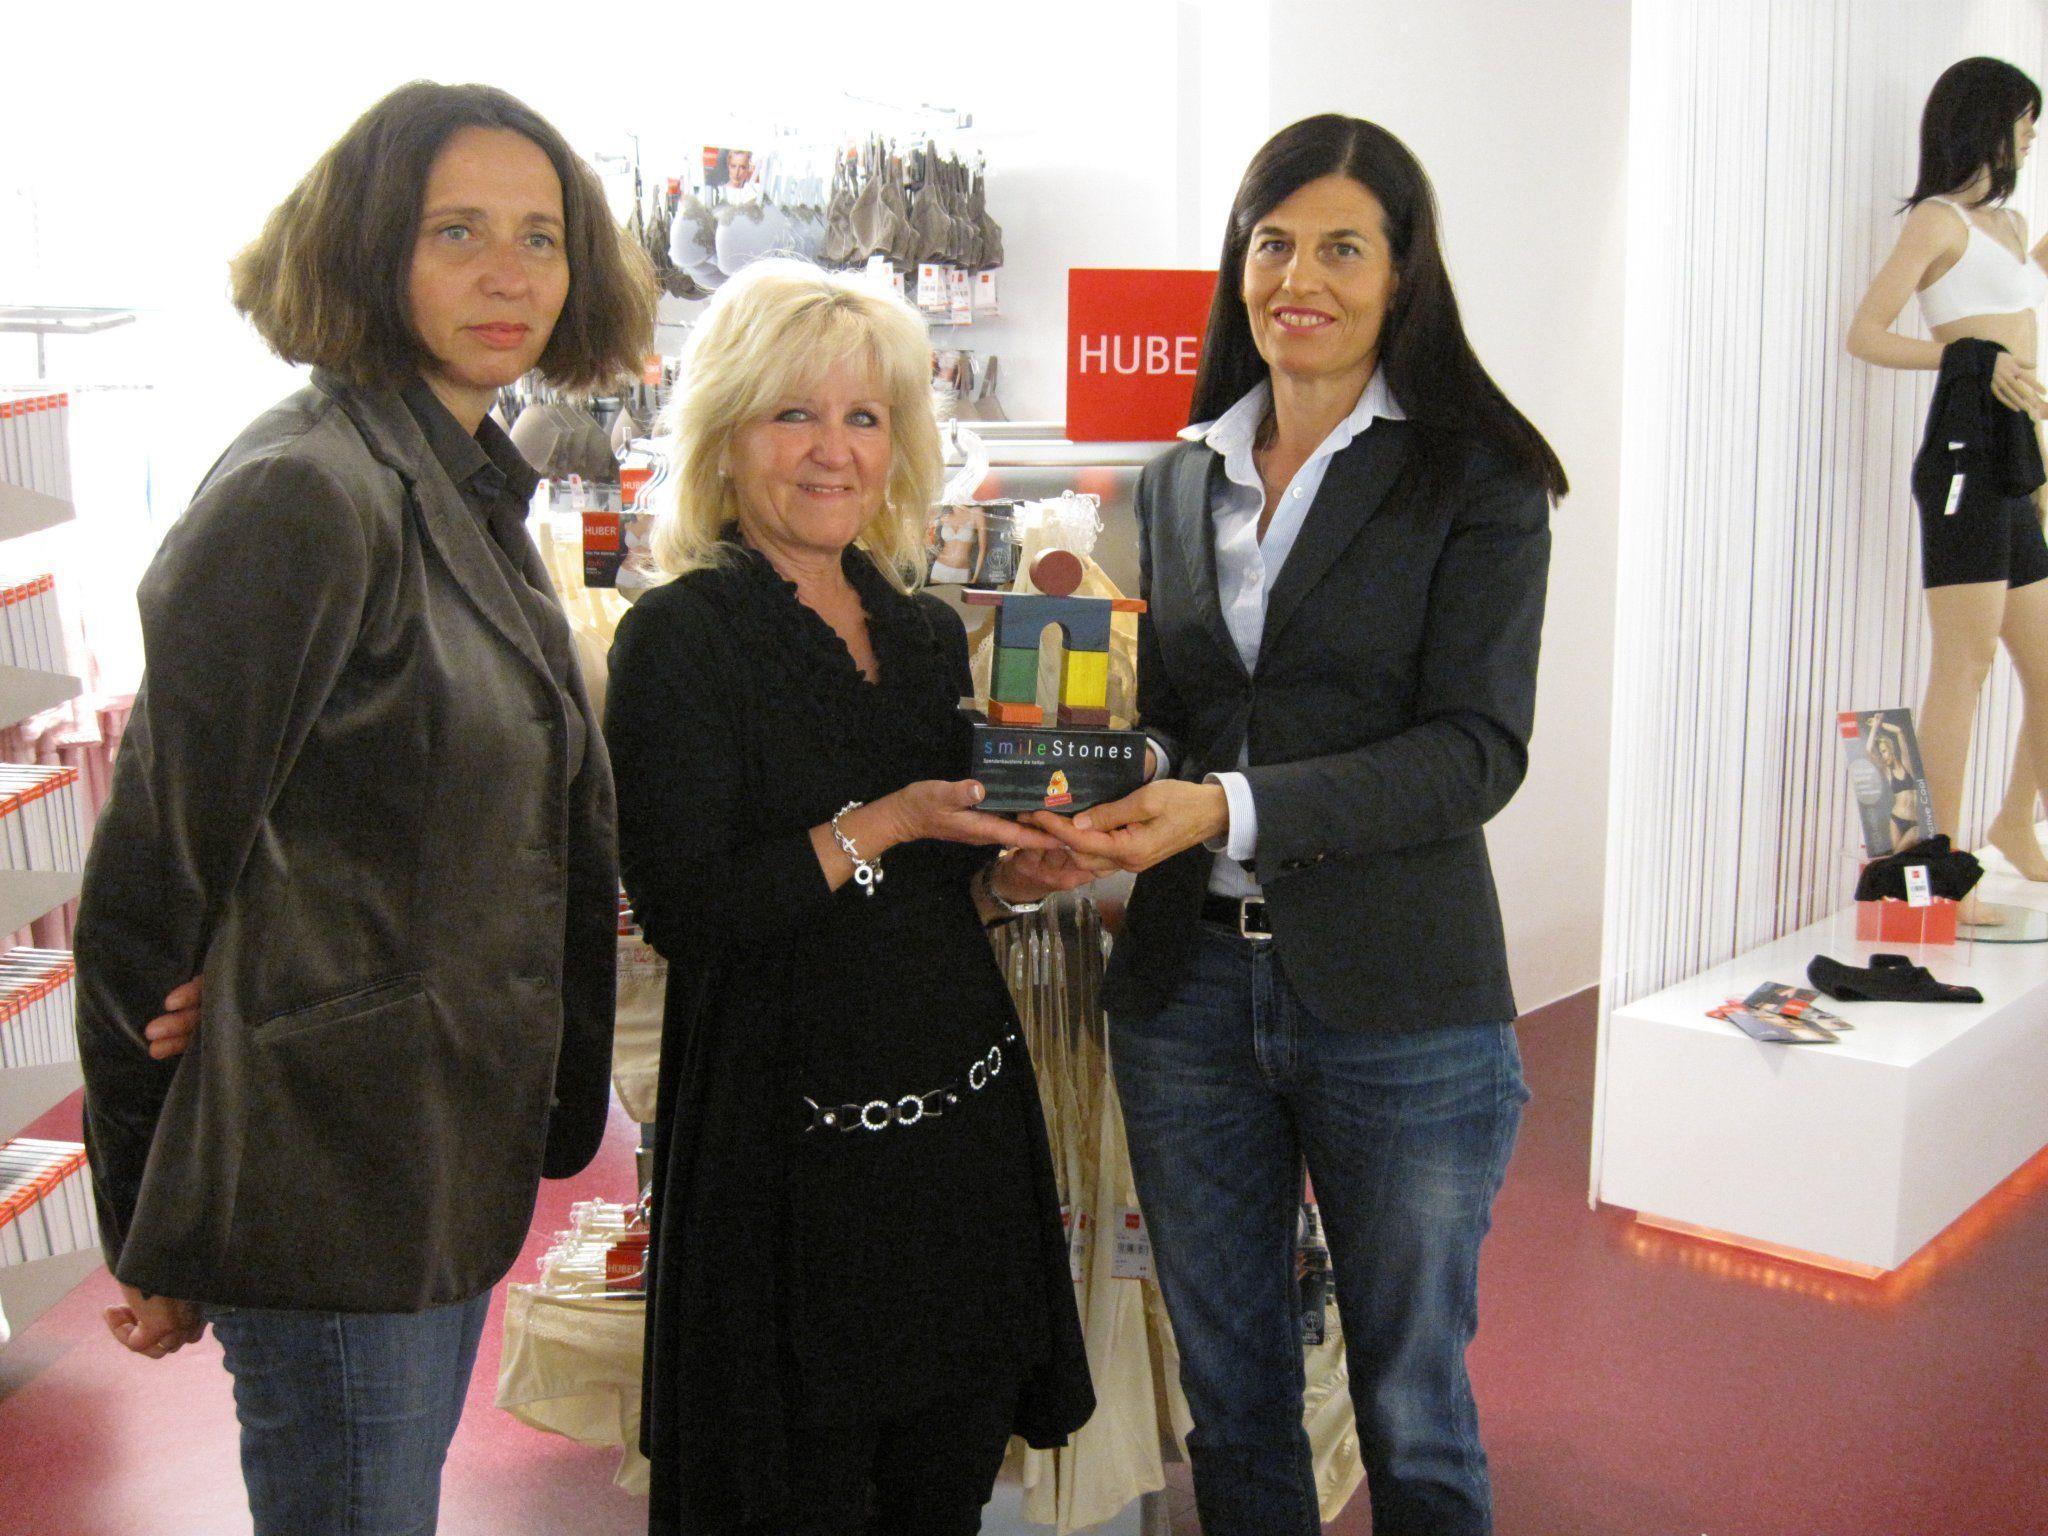 Gerti Hopp, Karin Geser (Huber Shop), Gaby Huber